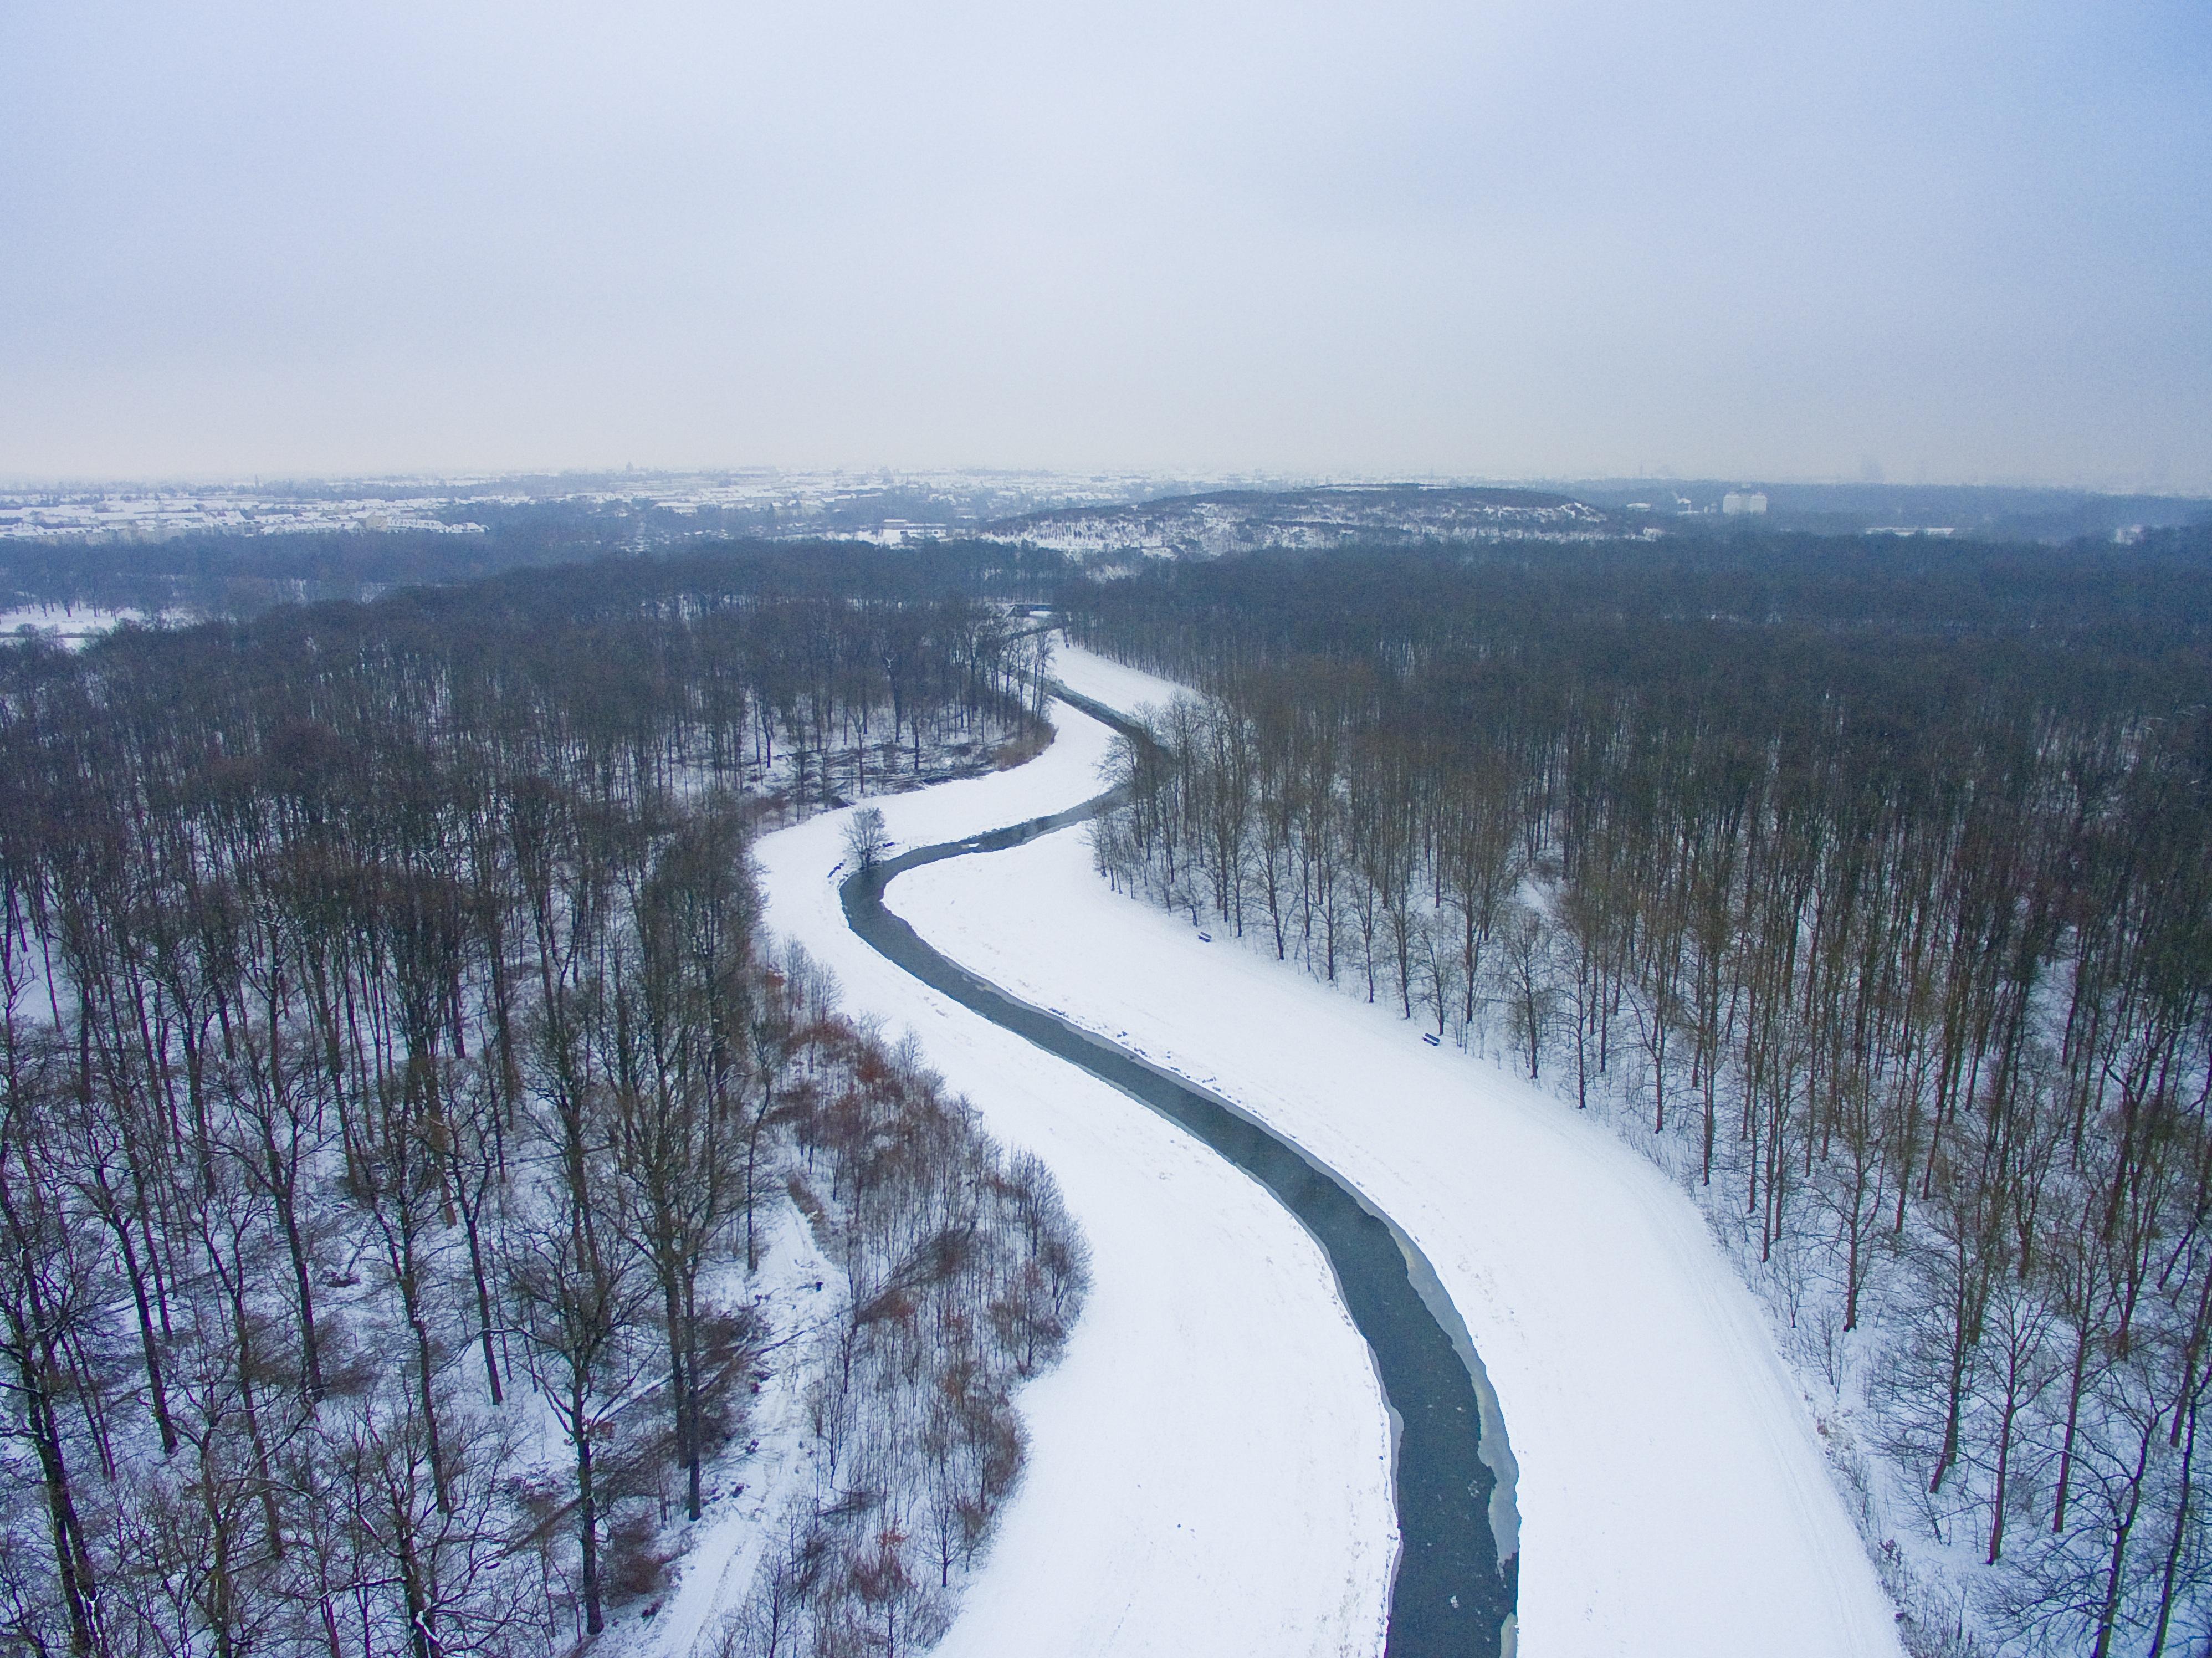 free images landscape water nature snow cold winter. Black Bedroom Furniture Sets. Home Design Ideas